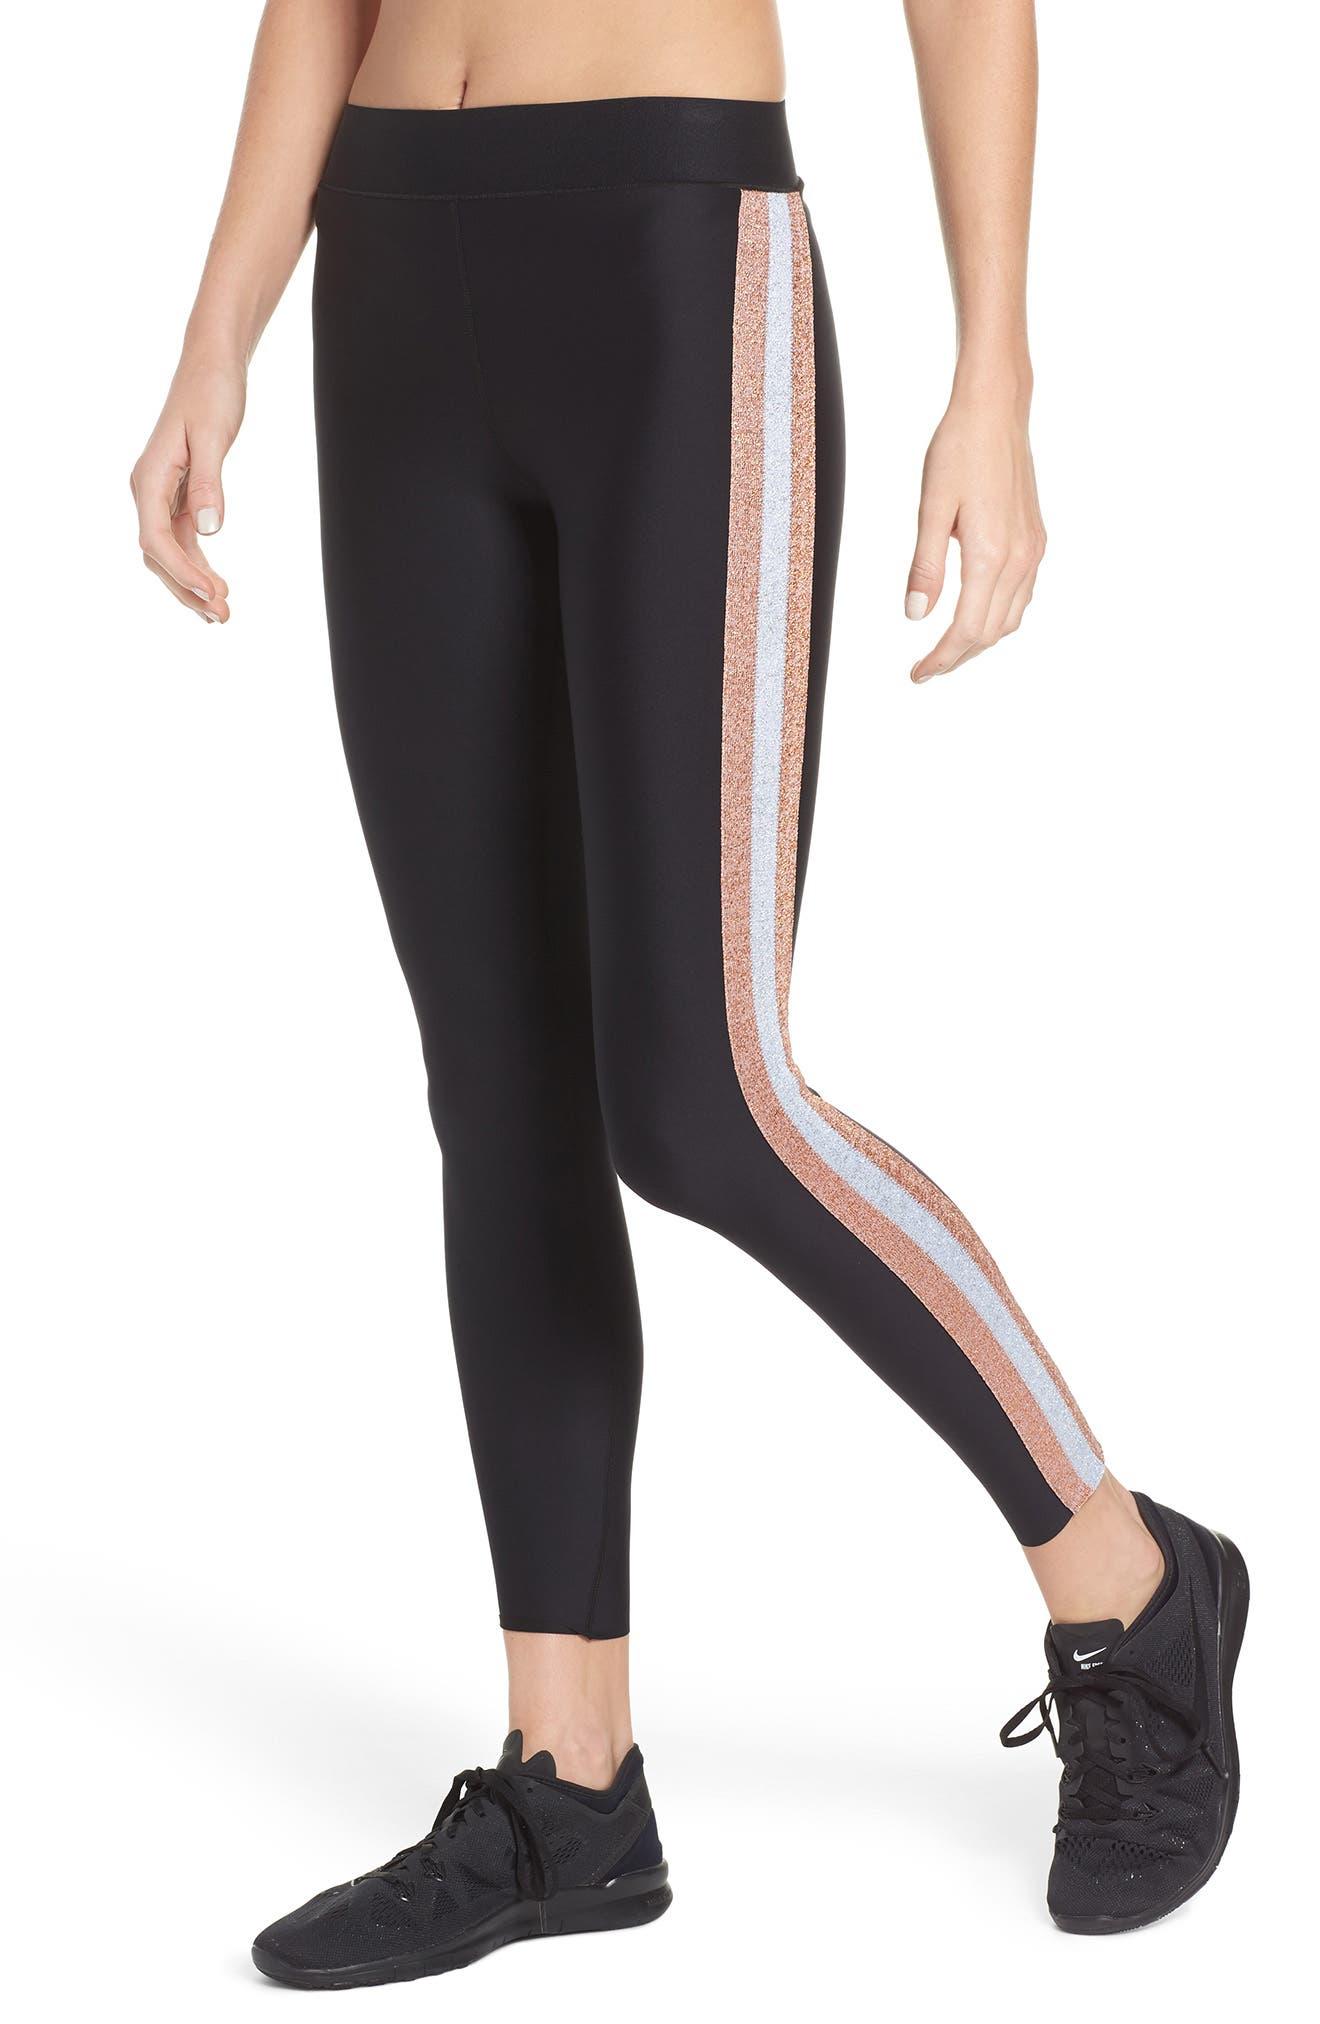 Ultra Lux Collegiate Leggings,                         Main,                         color, Nero Rose Silver